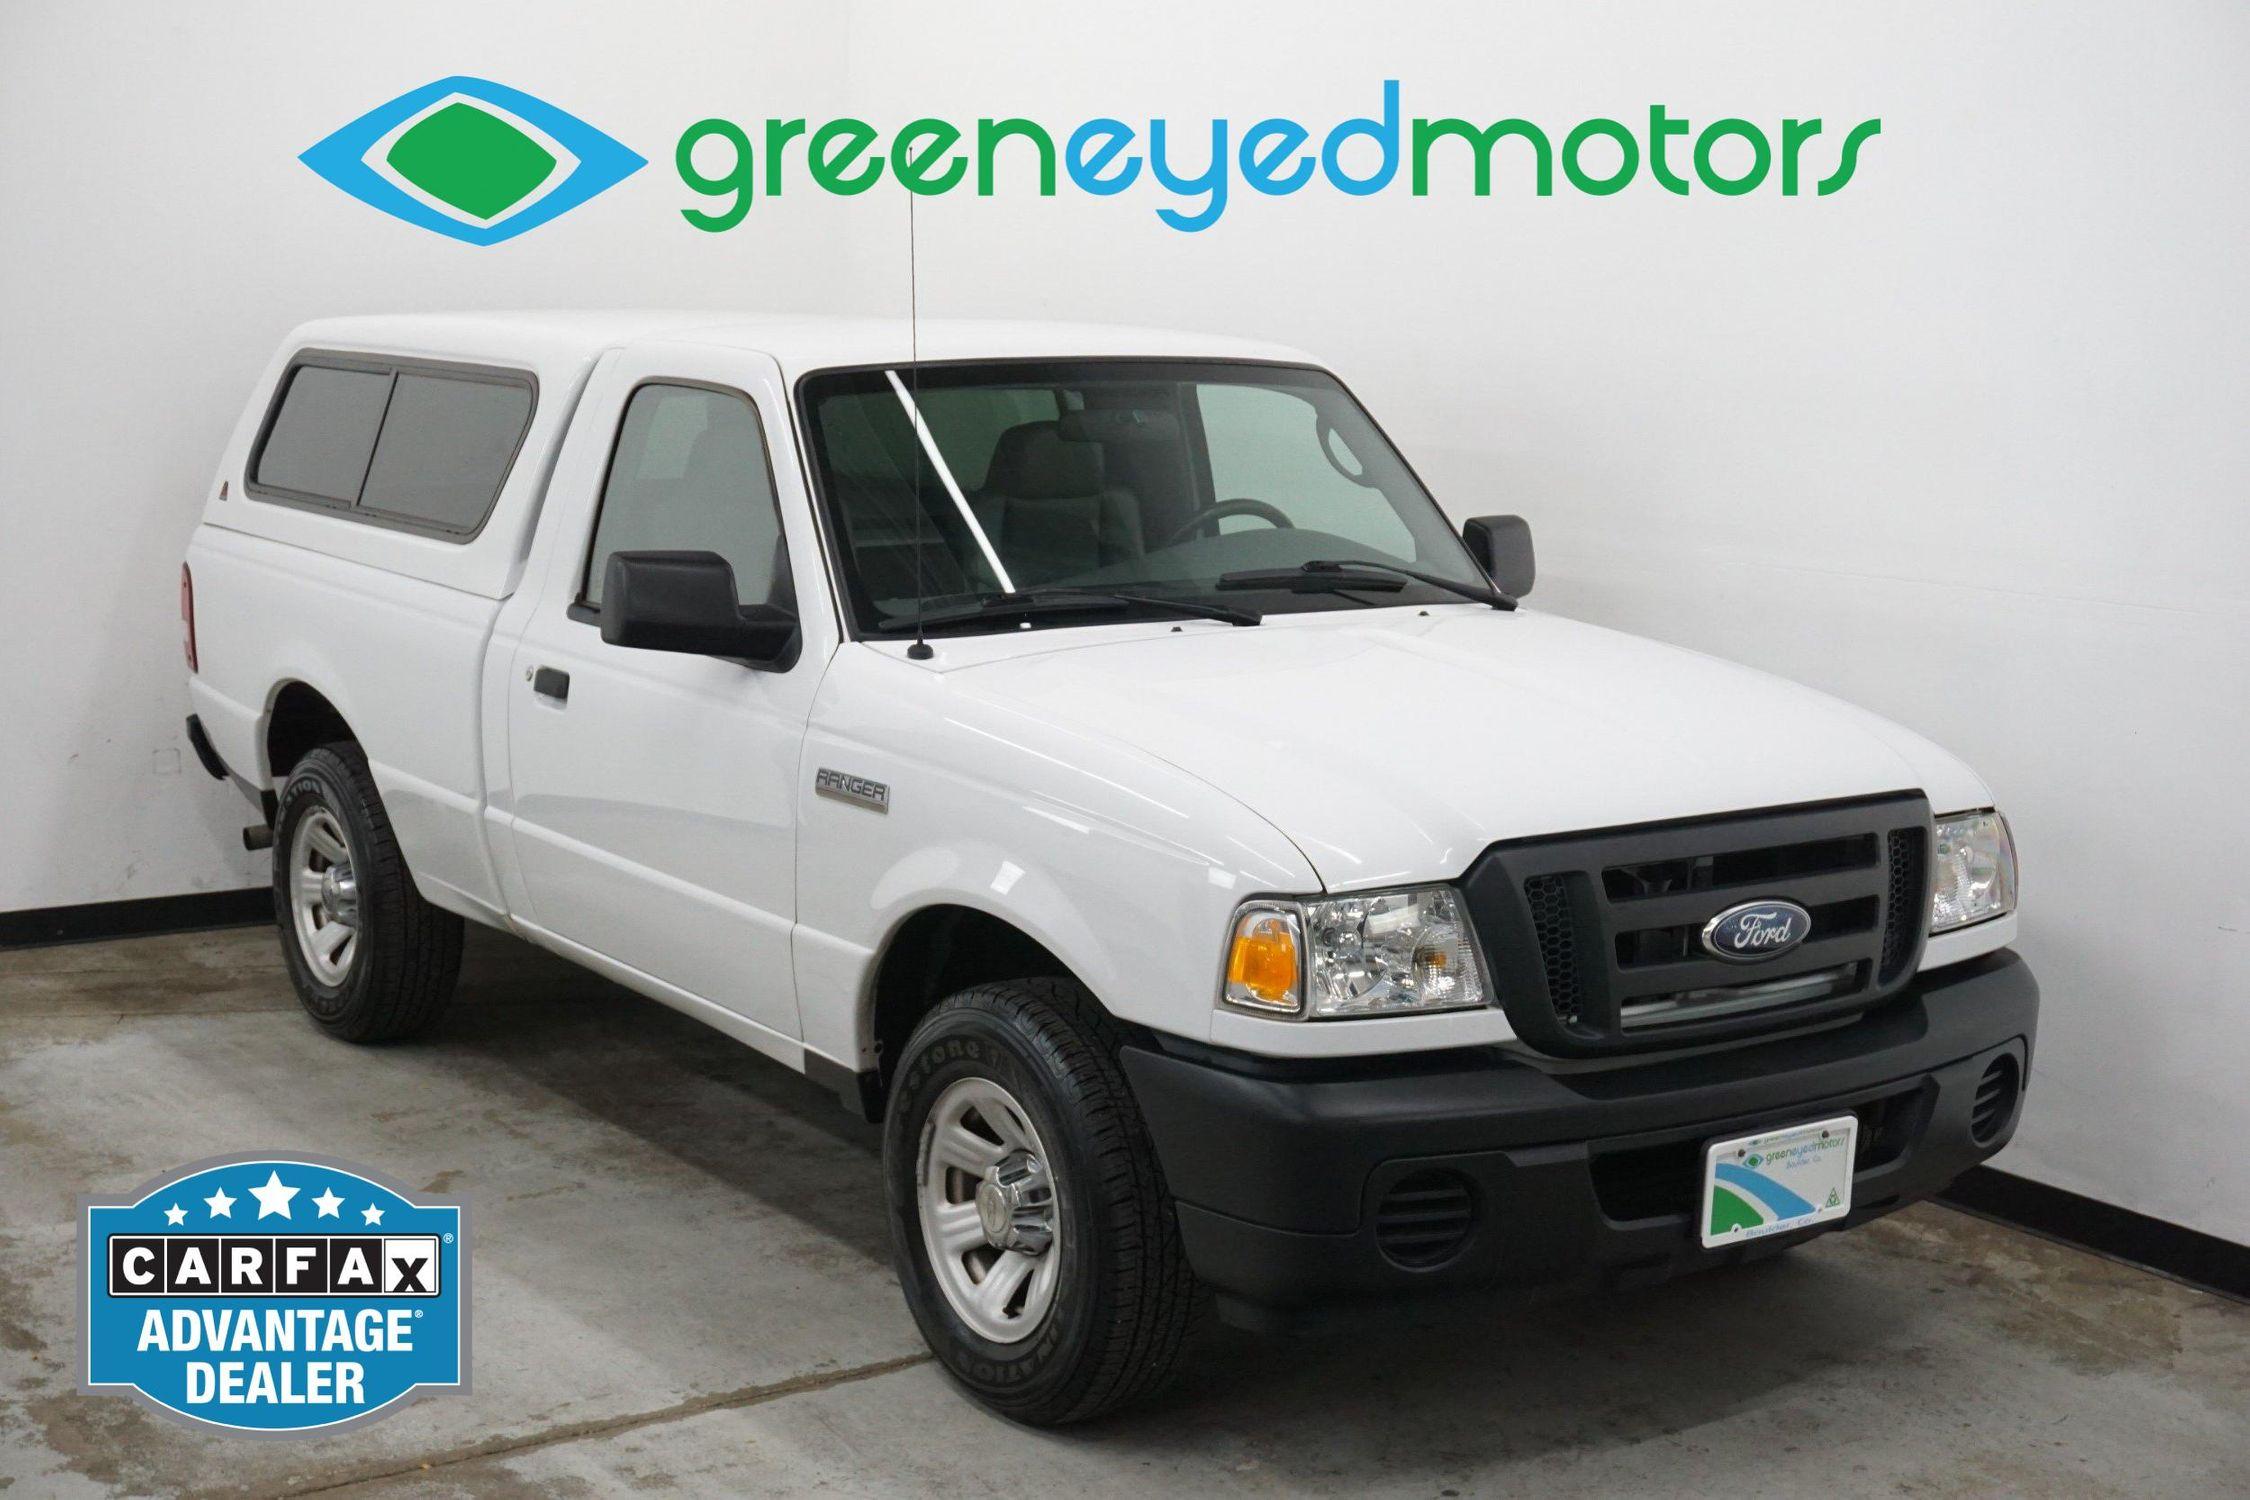 2008 Ford Ranger Xl Green Eyed Motors